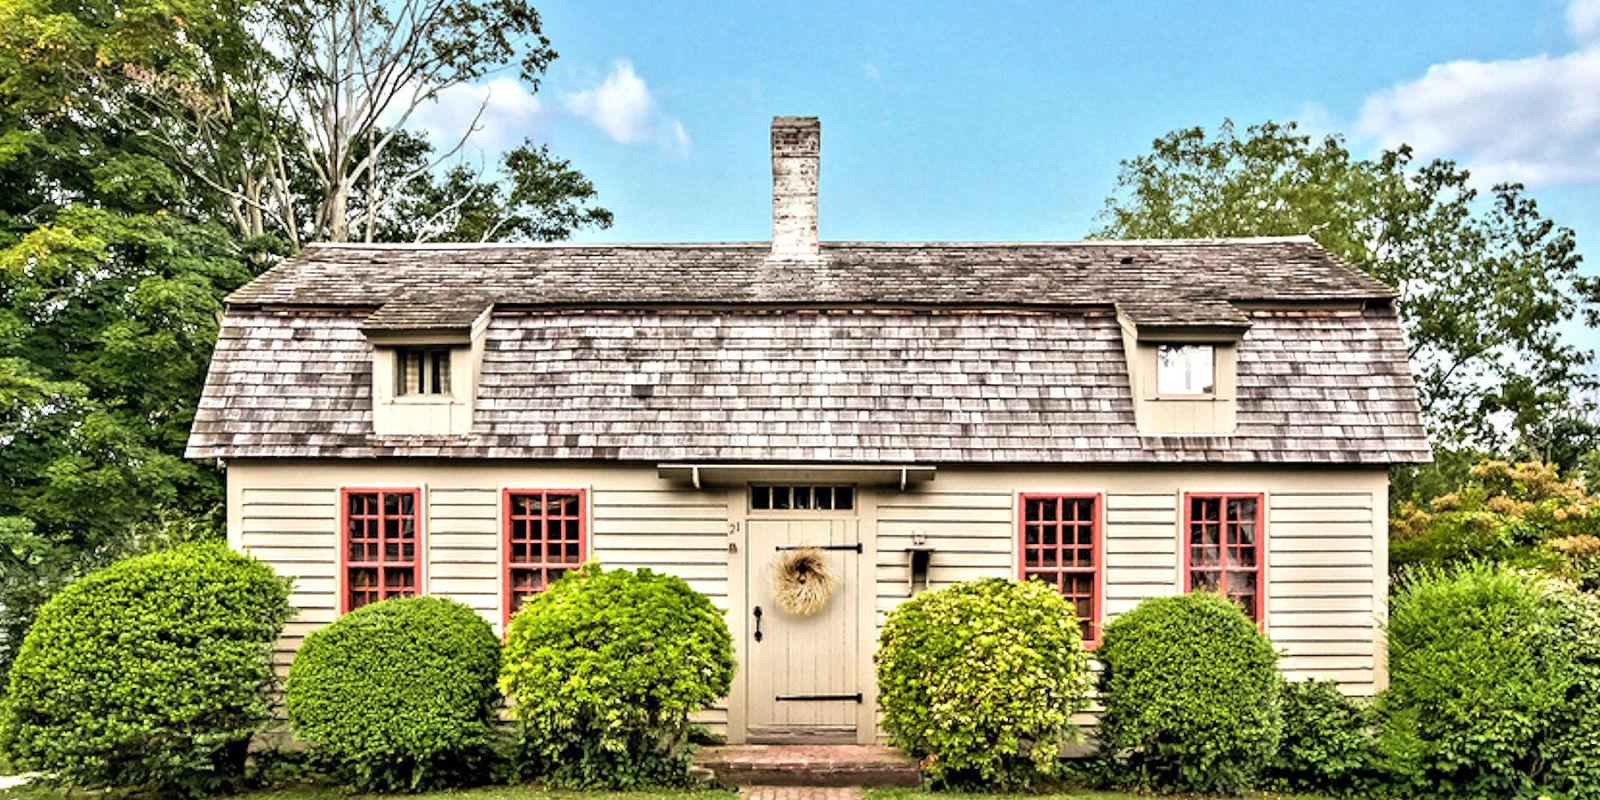 Characteristics of a cape cod style cottage historic for Cape cod architecture